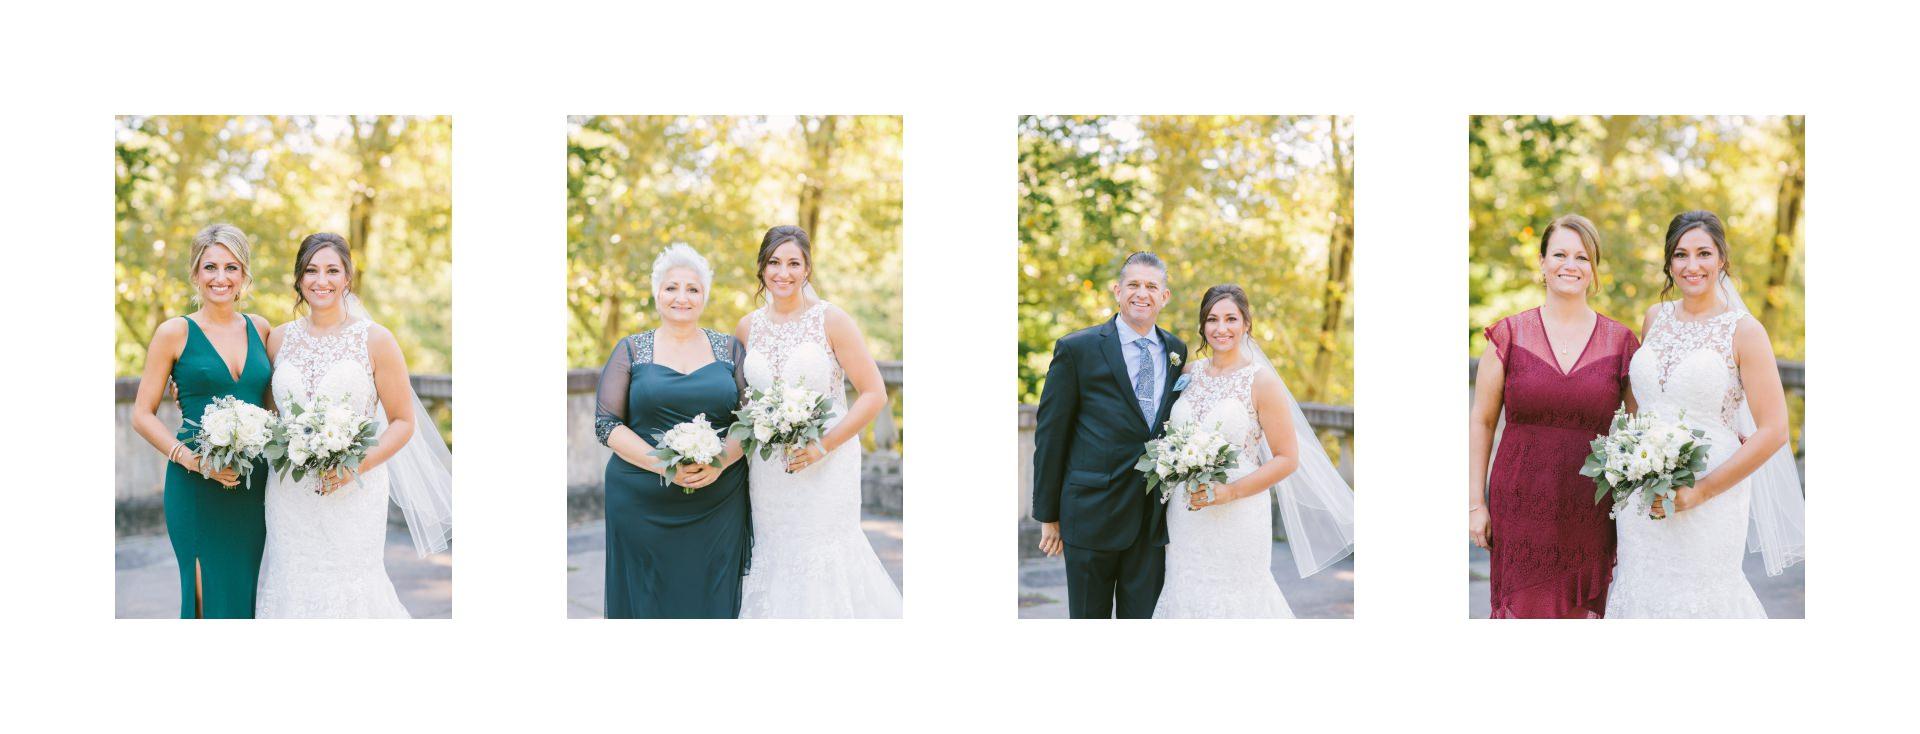 Browns First Energy Stadium Draft Room Wedding Photos 1 36.jpg